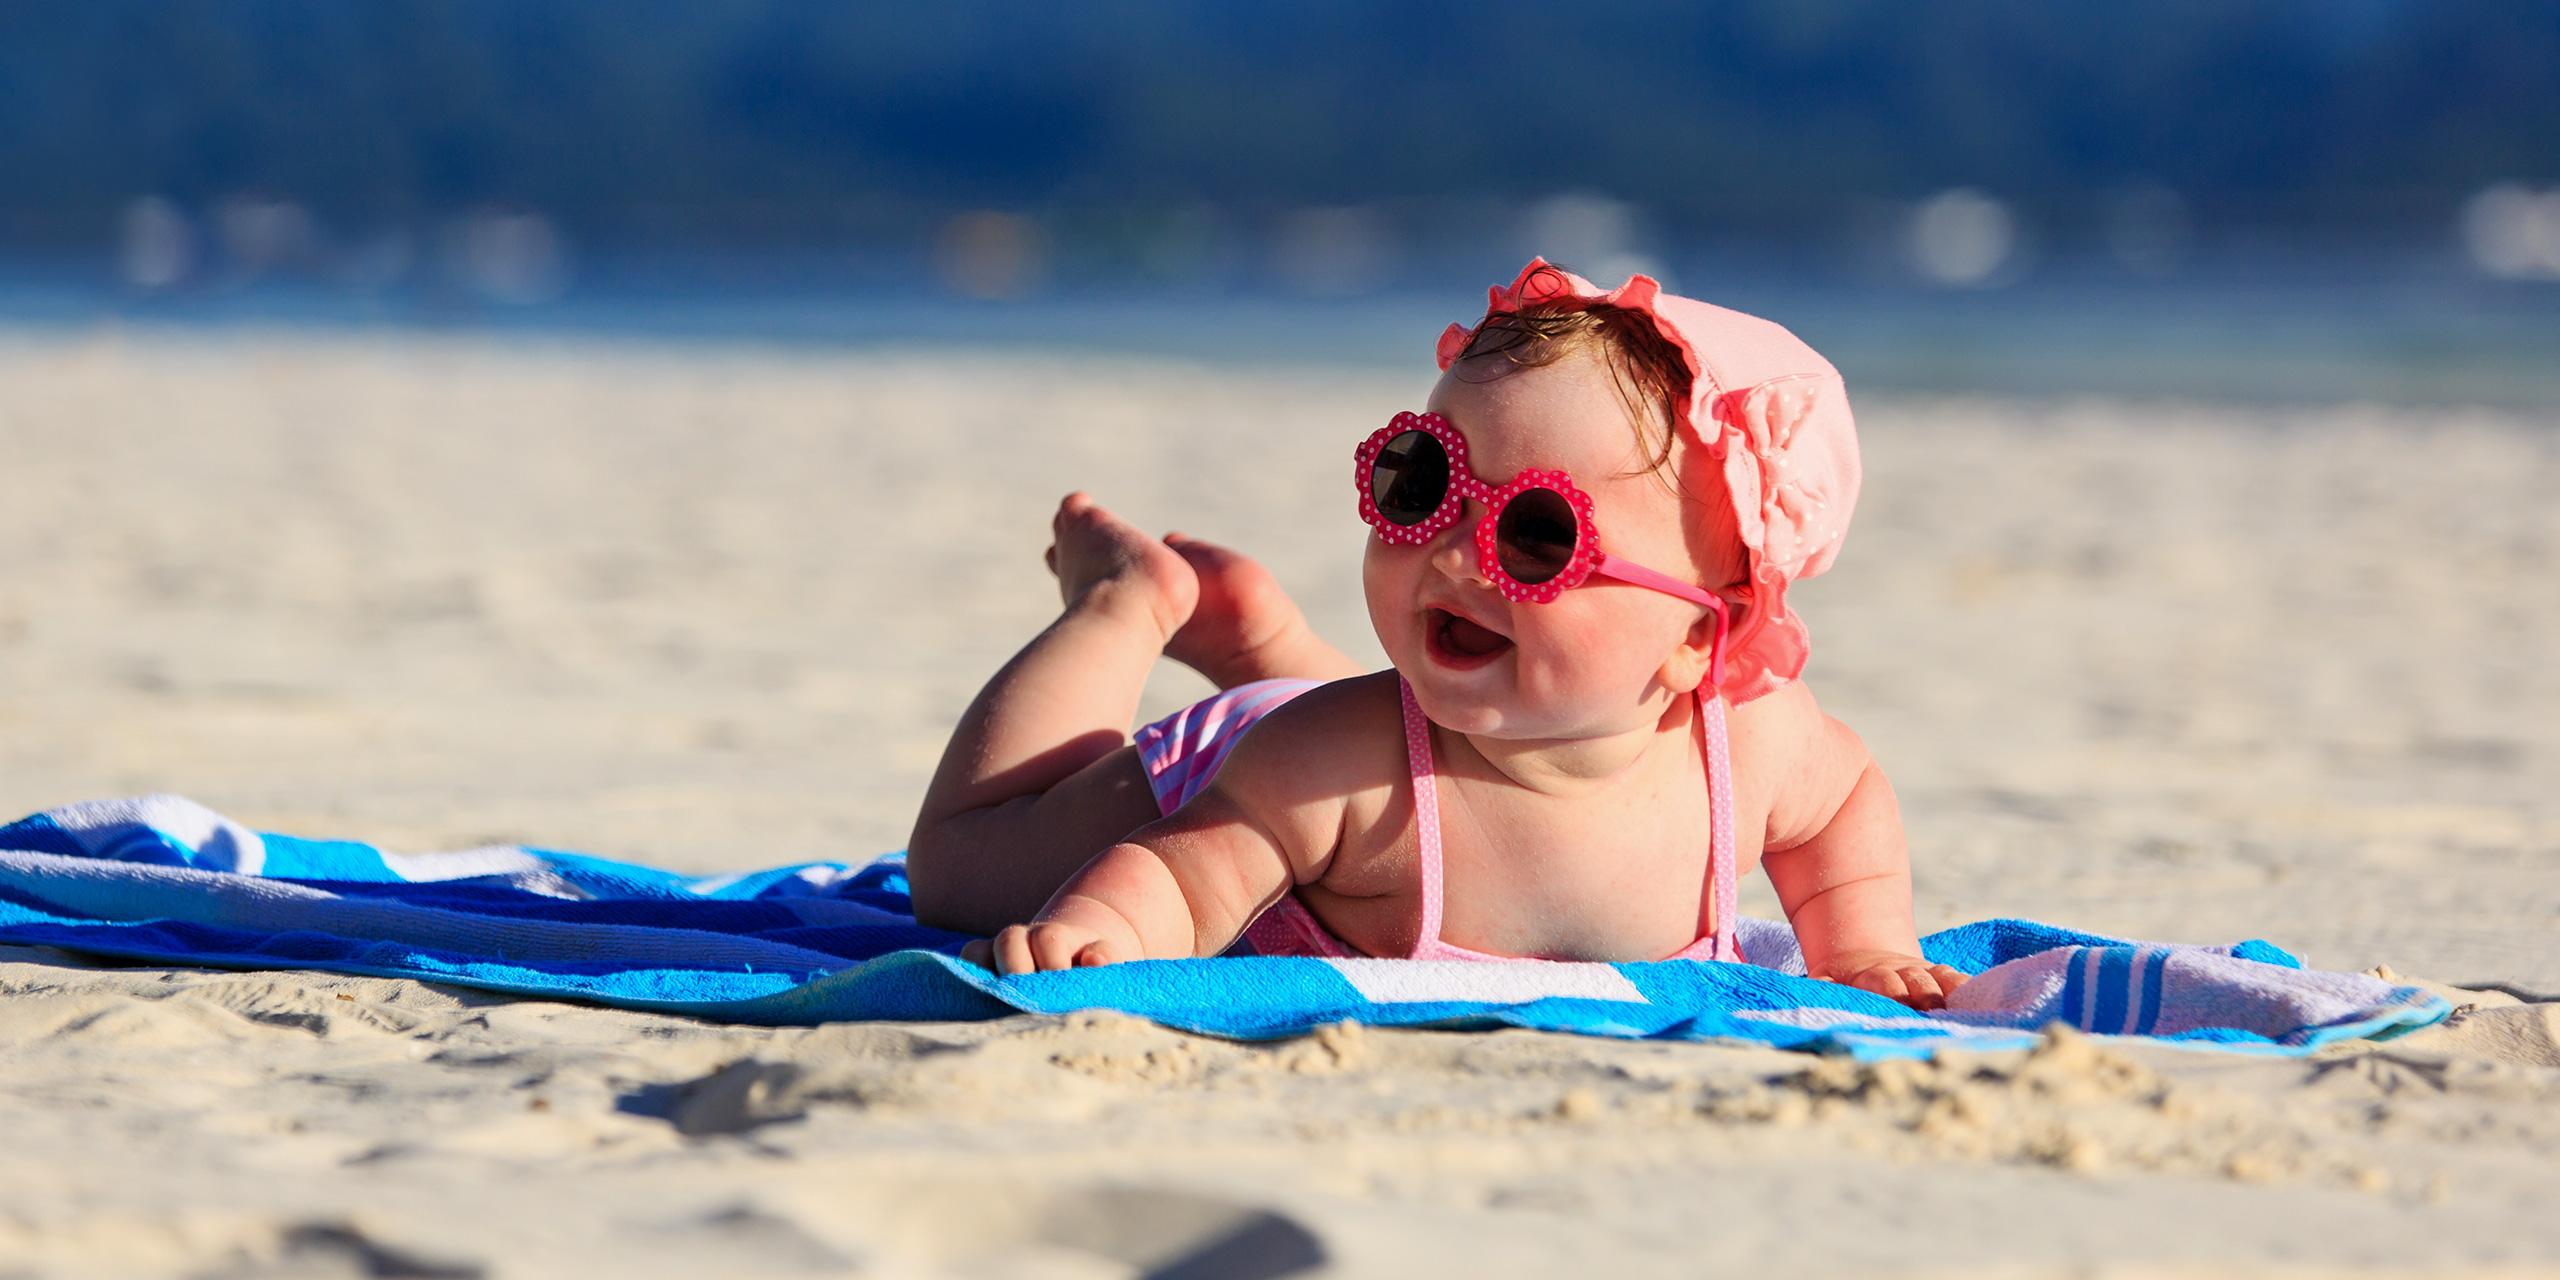 cute little baby girl on tropical sand beach ; Courtesy of NadyaEugene/Shutterstock